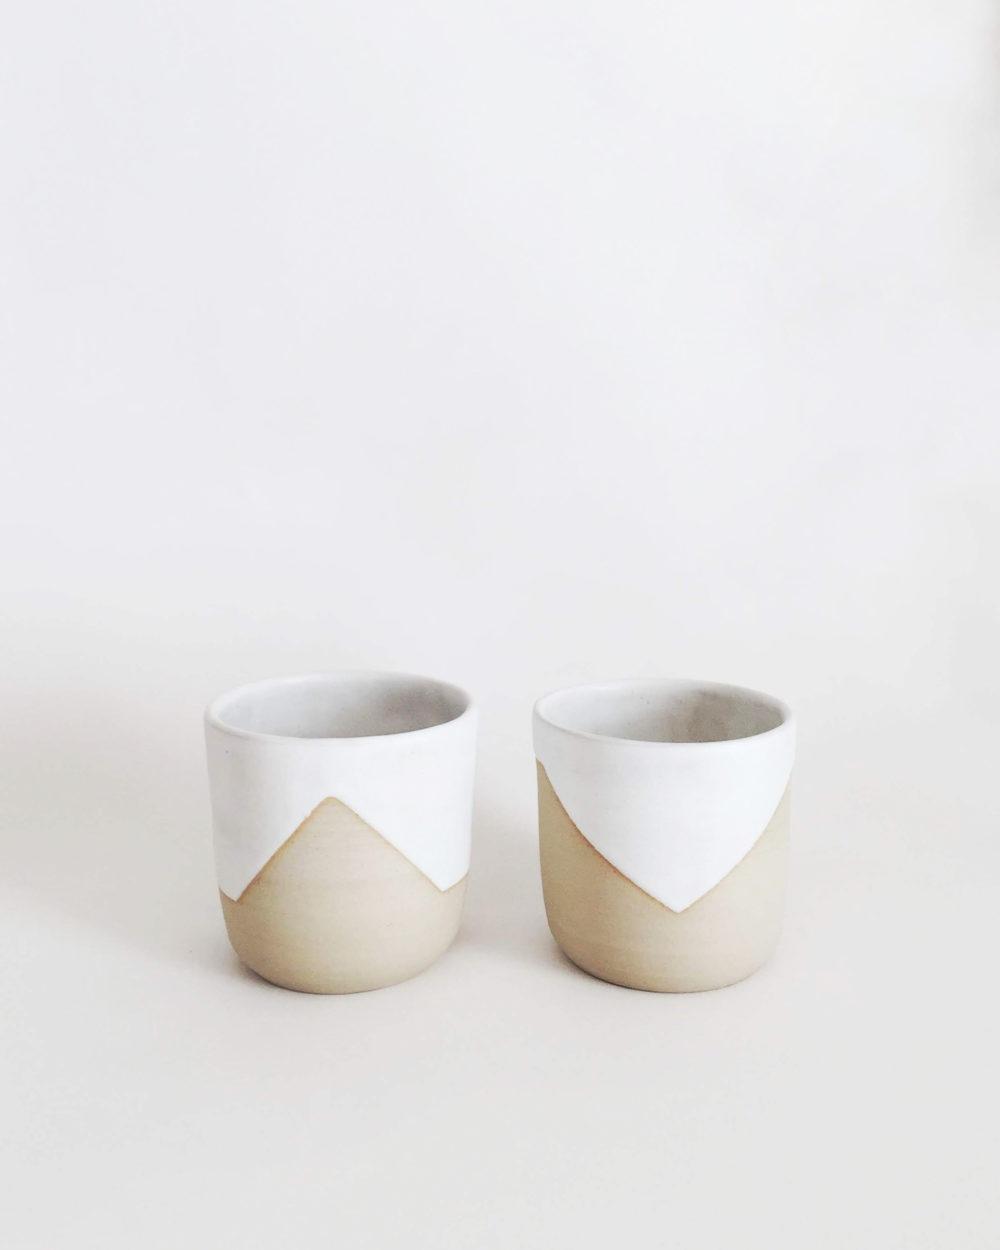 Ceràmica utilitaria